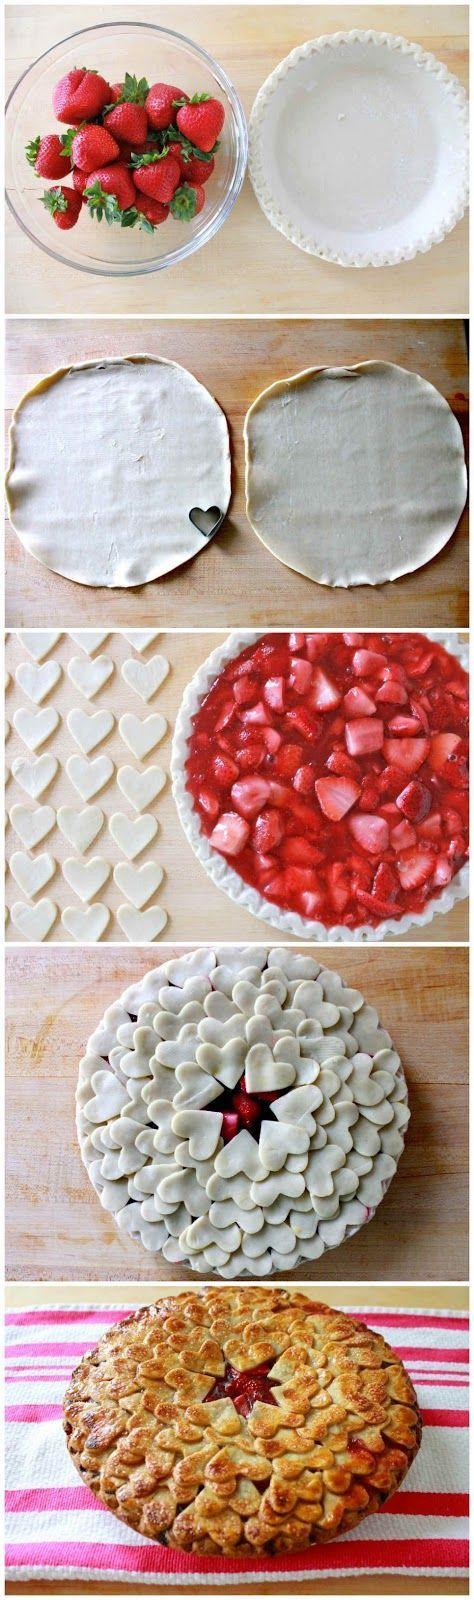 Strawberry Heart Pie. Amazing!